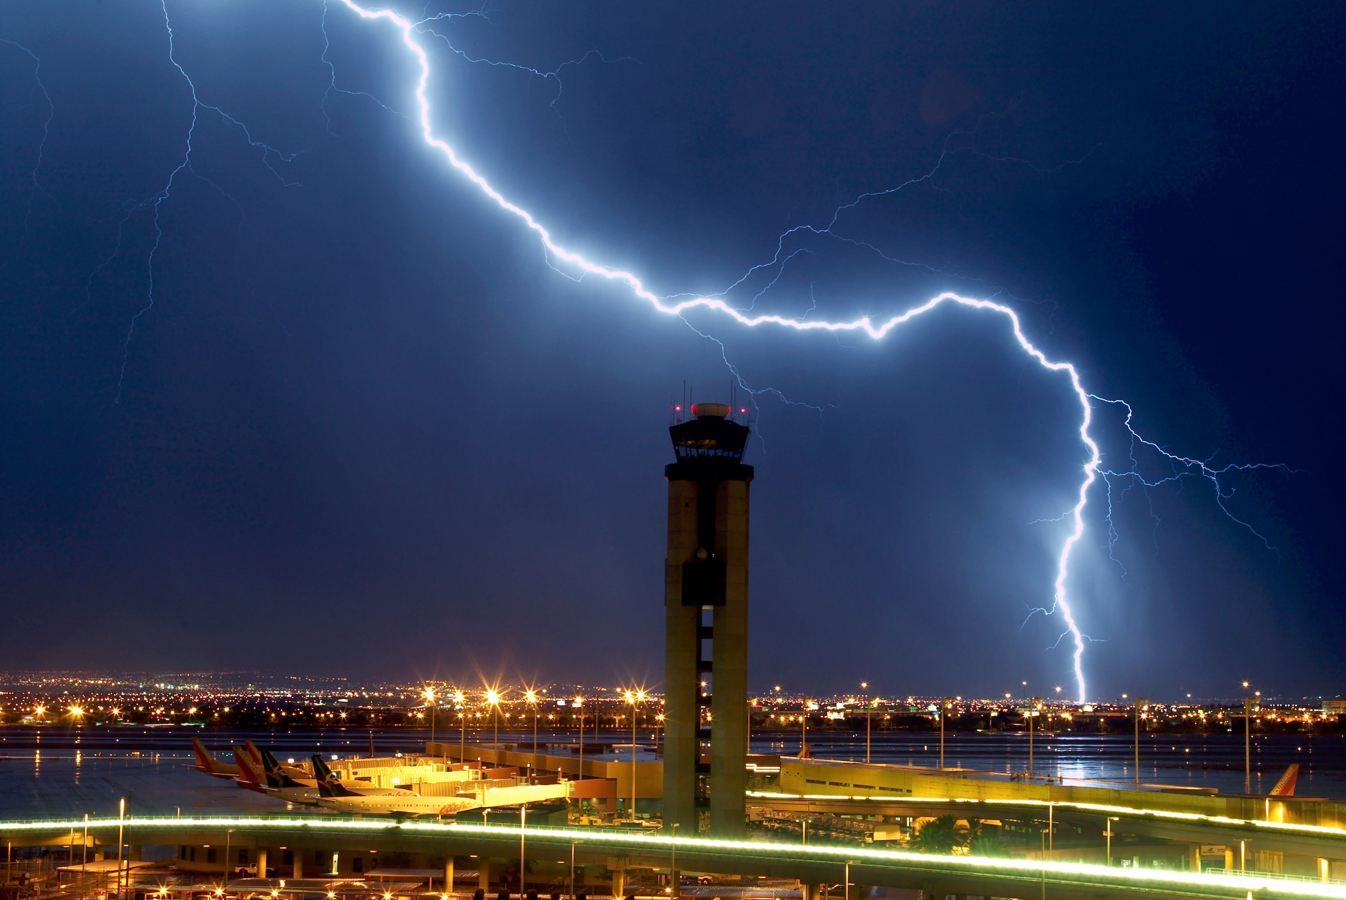 Lightning strikes just south of the McCarran International